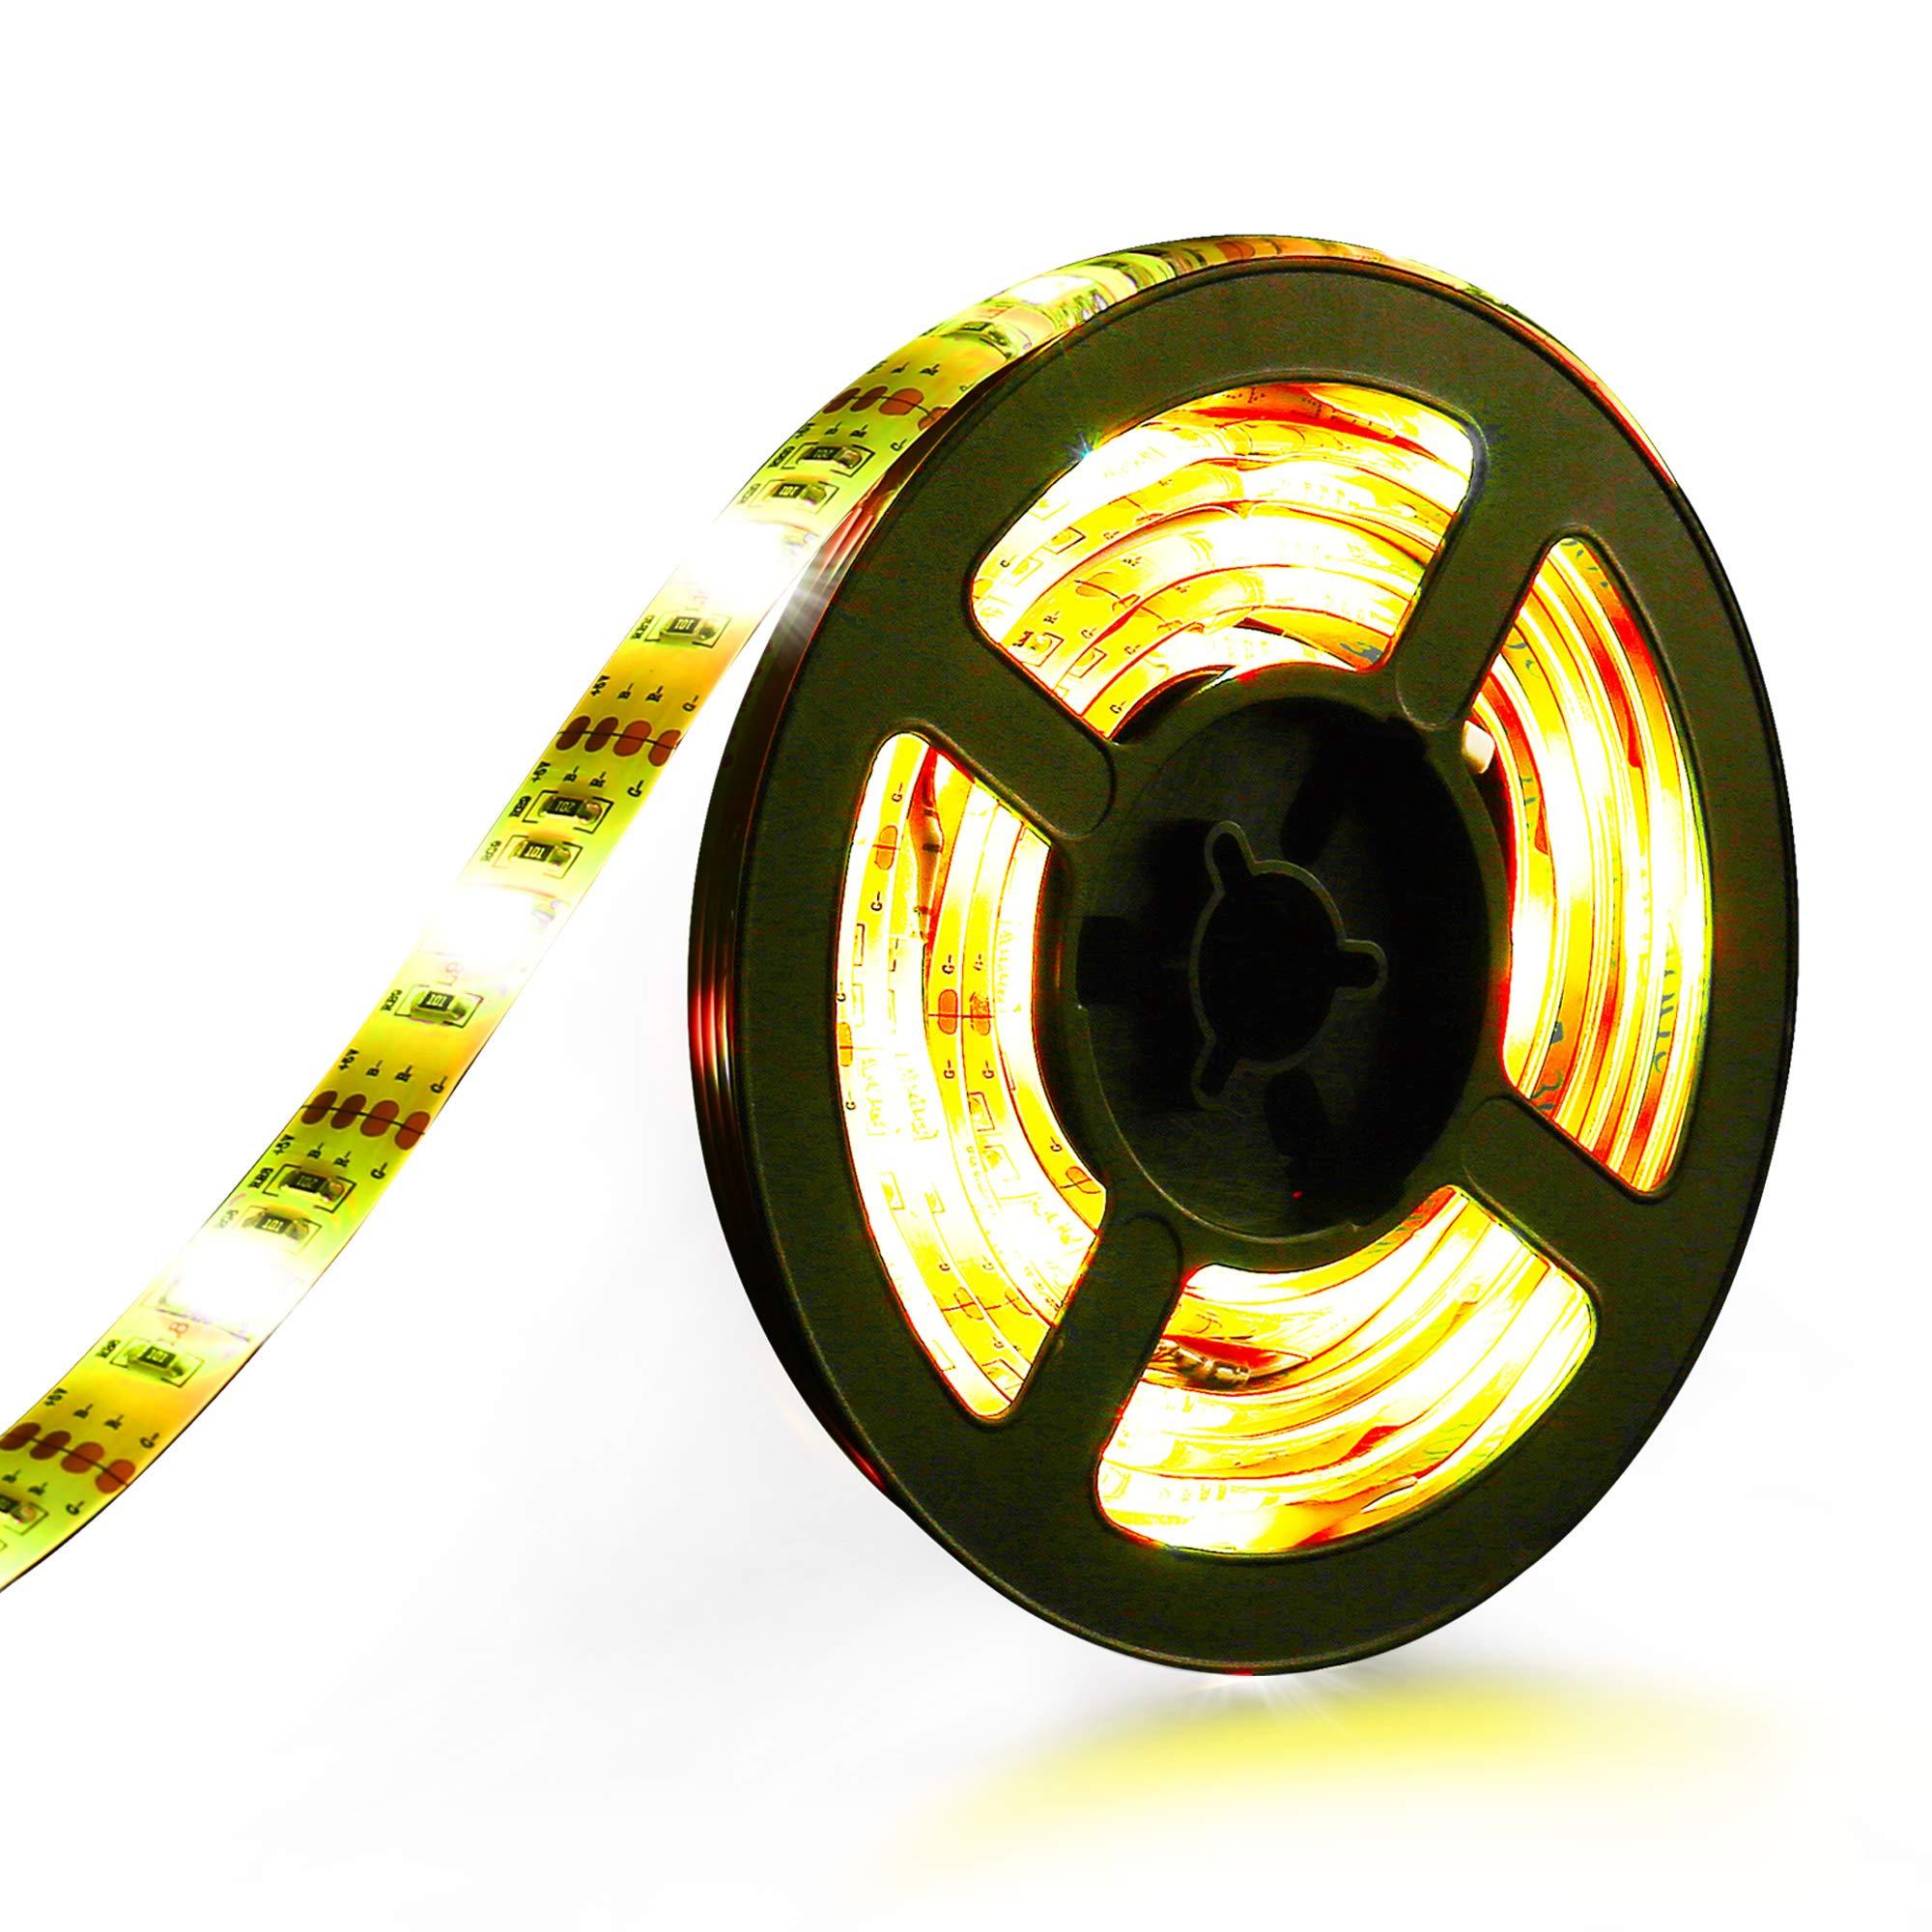 Zerproc LED TV Lights, 6.56ft 60 LED RGB Strip Lights, Voice Sensor & Remote Control, Music LED Strip Lights Kit for 30 Inch to 60 inch HDTV PC Board, Computer, Laptop and Indoor Decoration